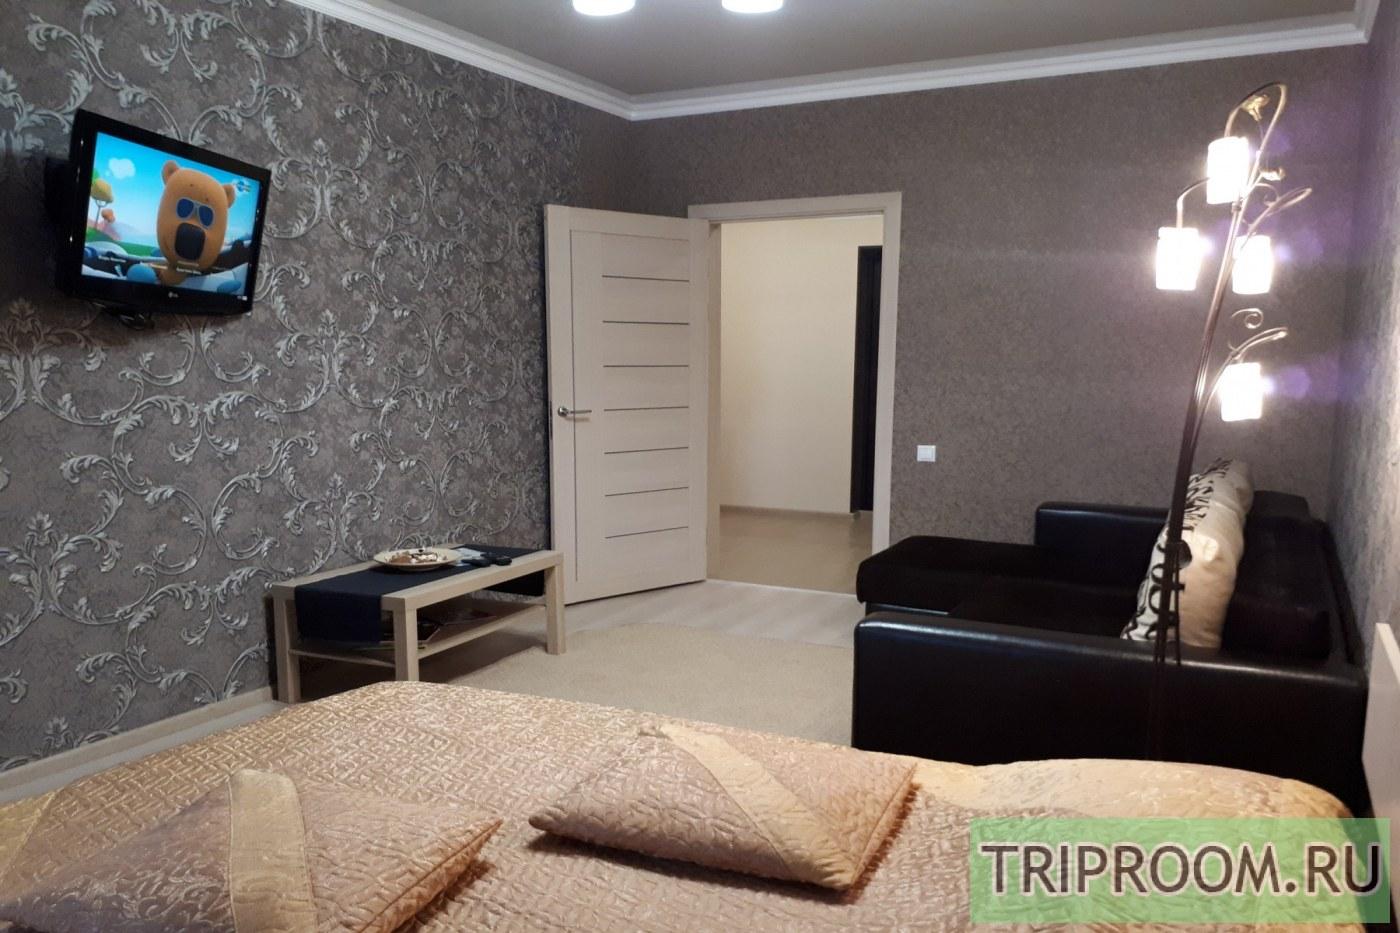 1-комнатная квартира посуточно (вариант № 39060), ул. Симиренко улица, фото № 3